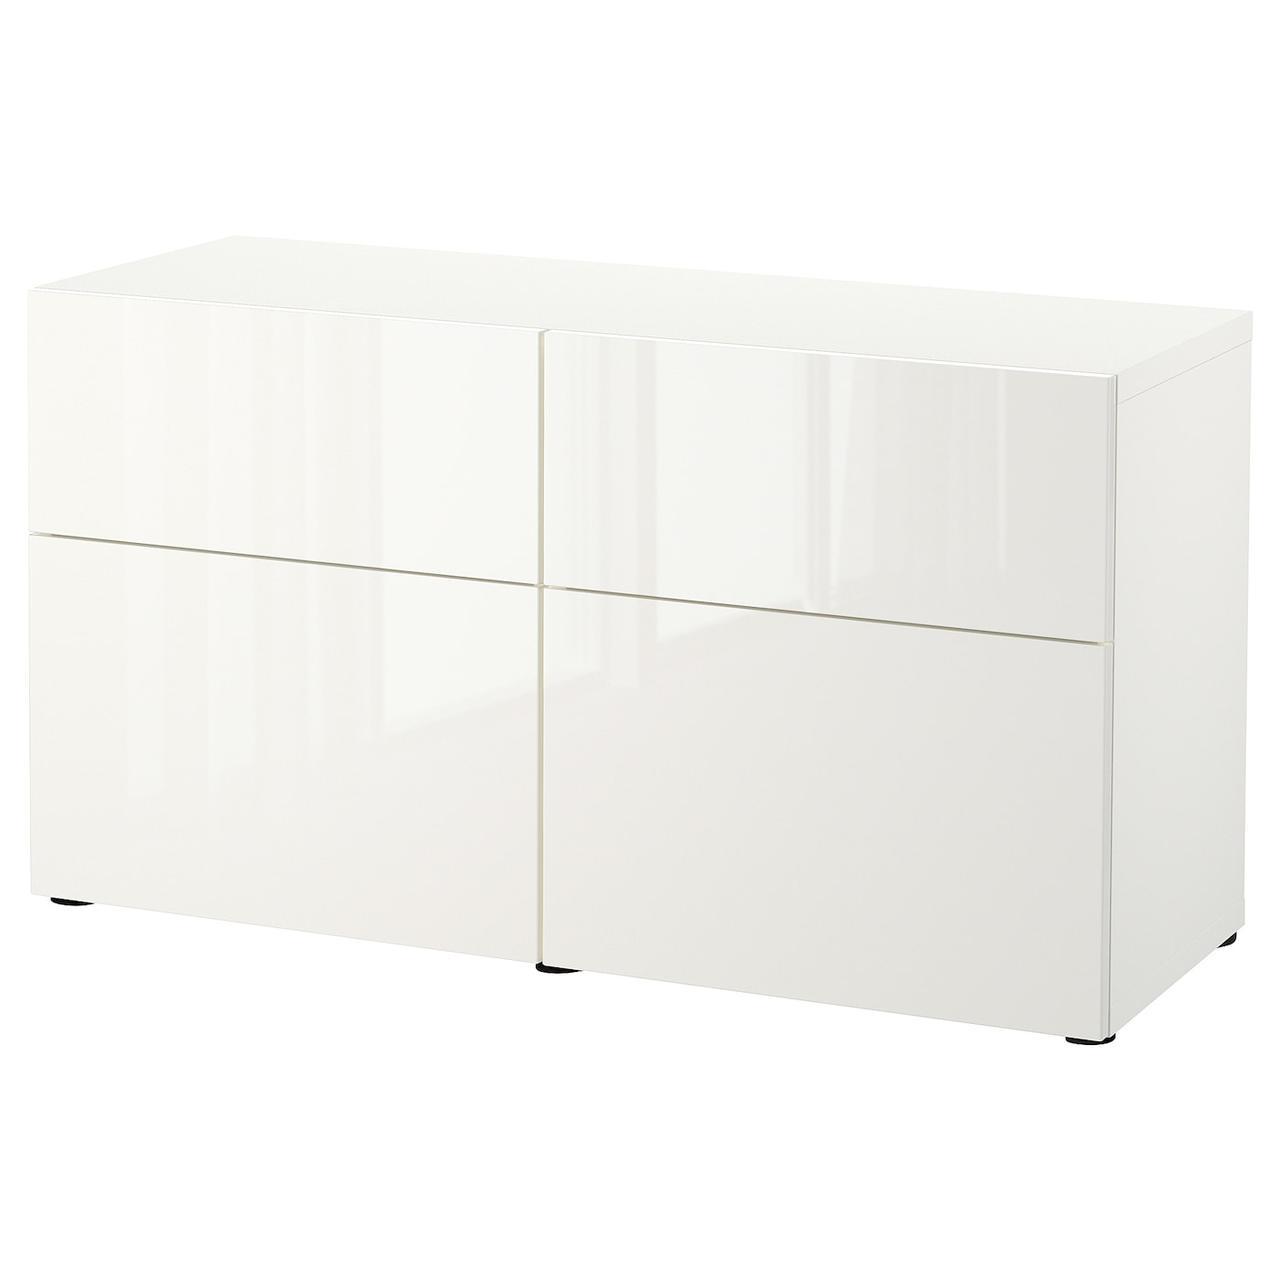 IKEA BESTA Тумба под телевизор 120x42x65 cm (893.247.70)